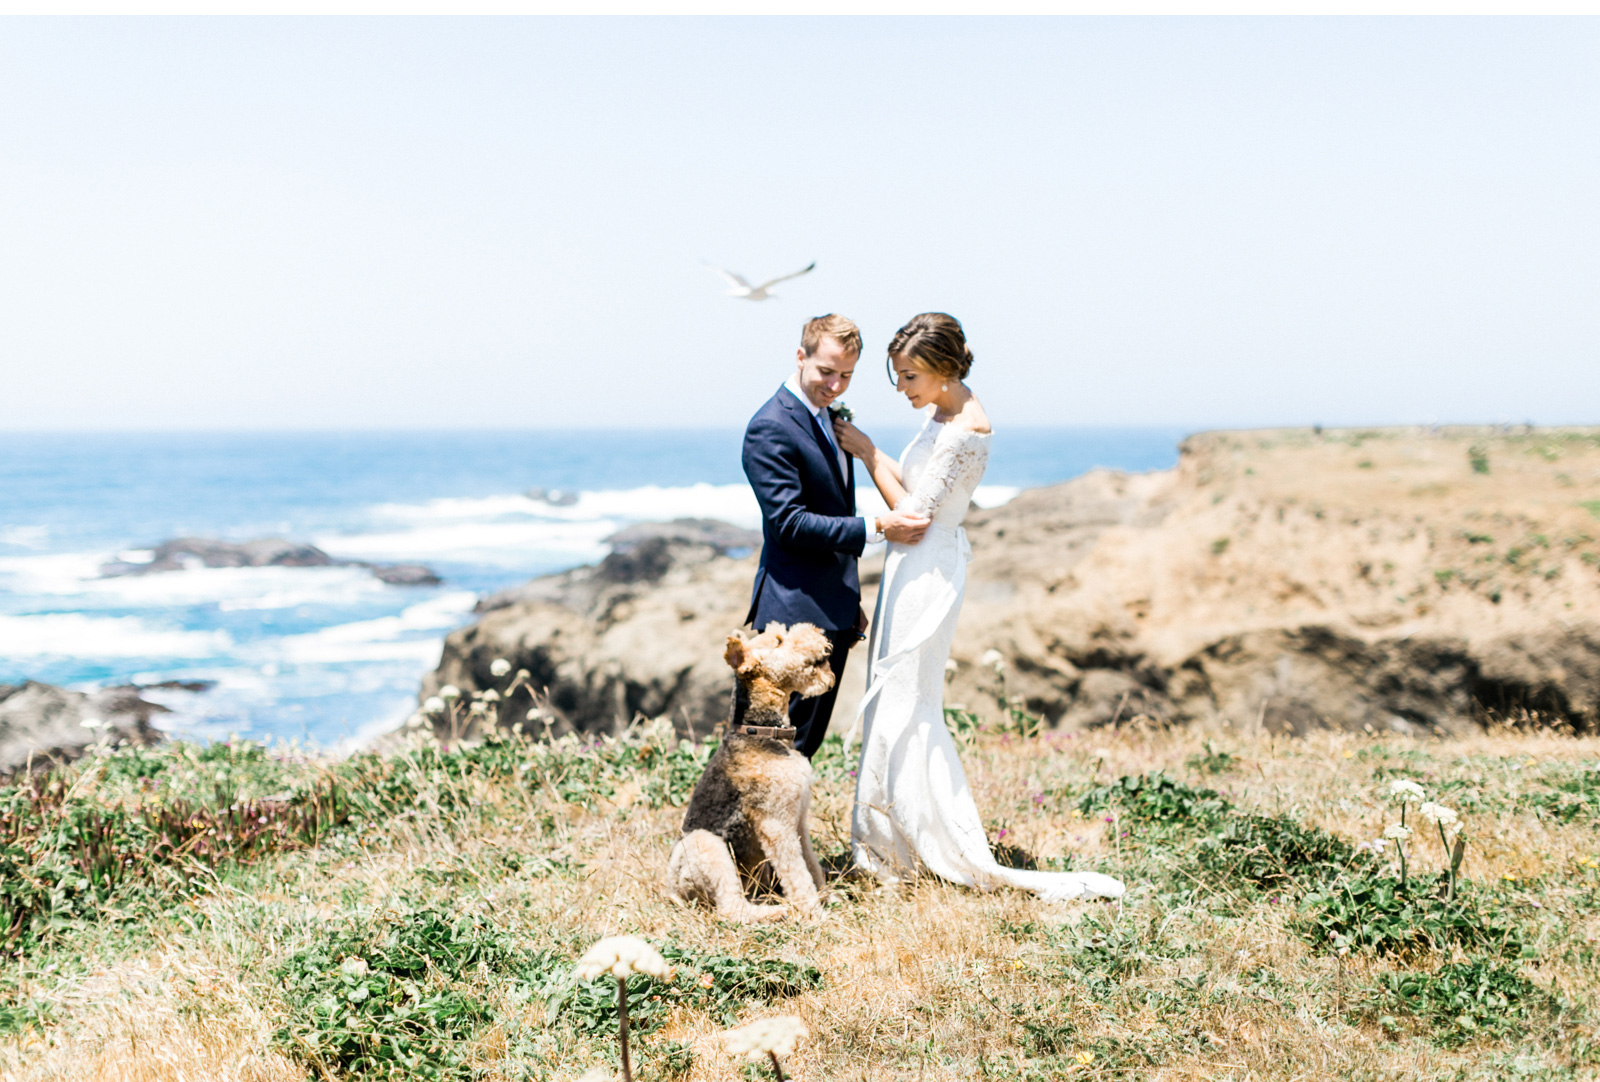 Mendocino-wedding-photographer-natalie-schutt-photography_15.jpg